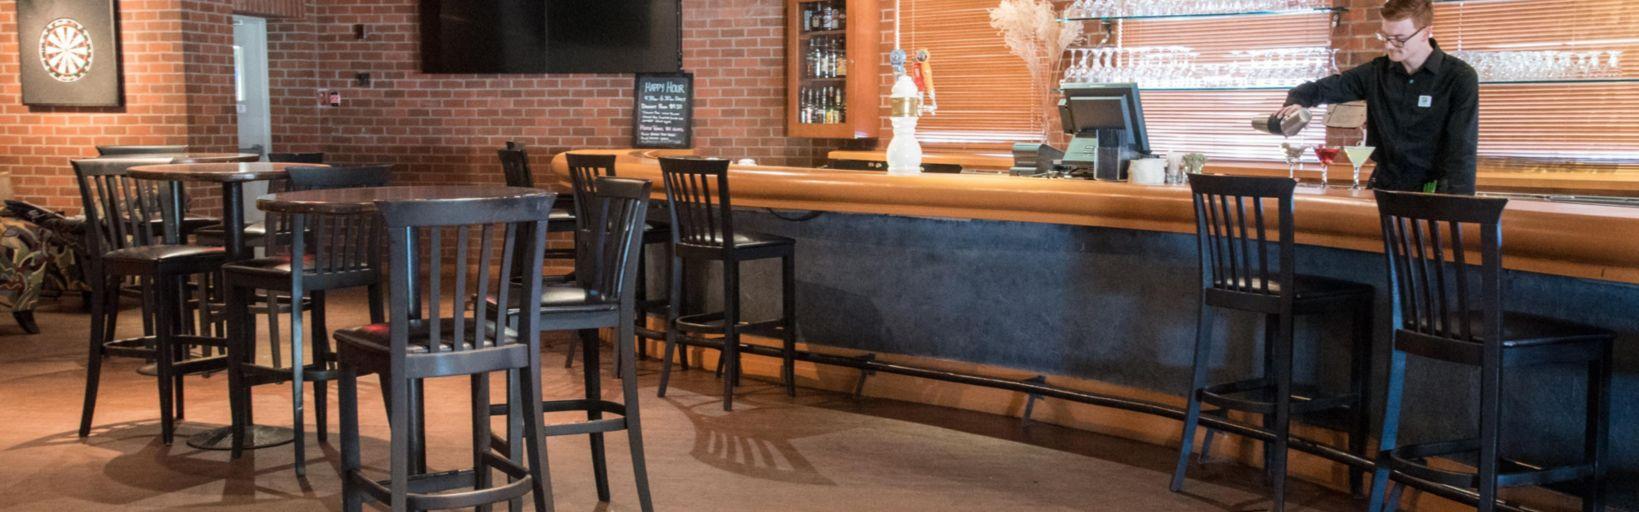 Gatekeeper Lounge Restaurant Fireplace